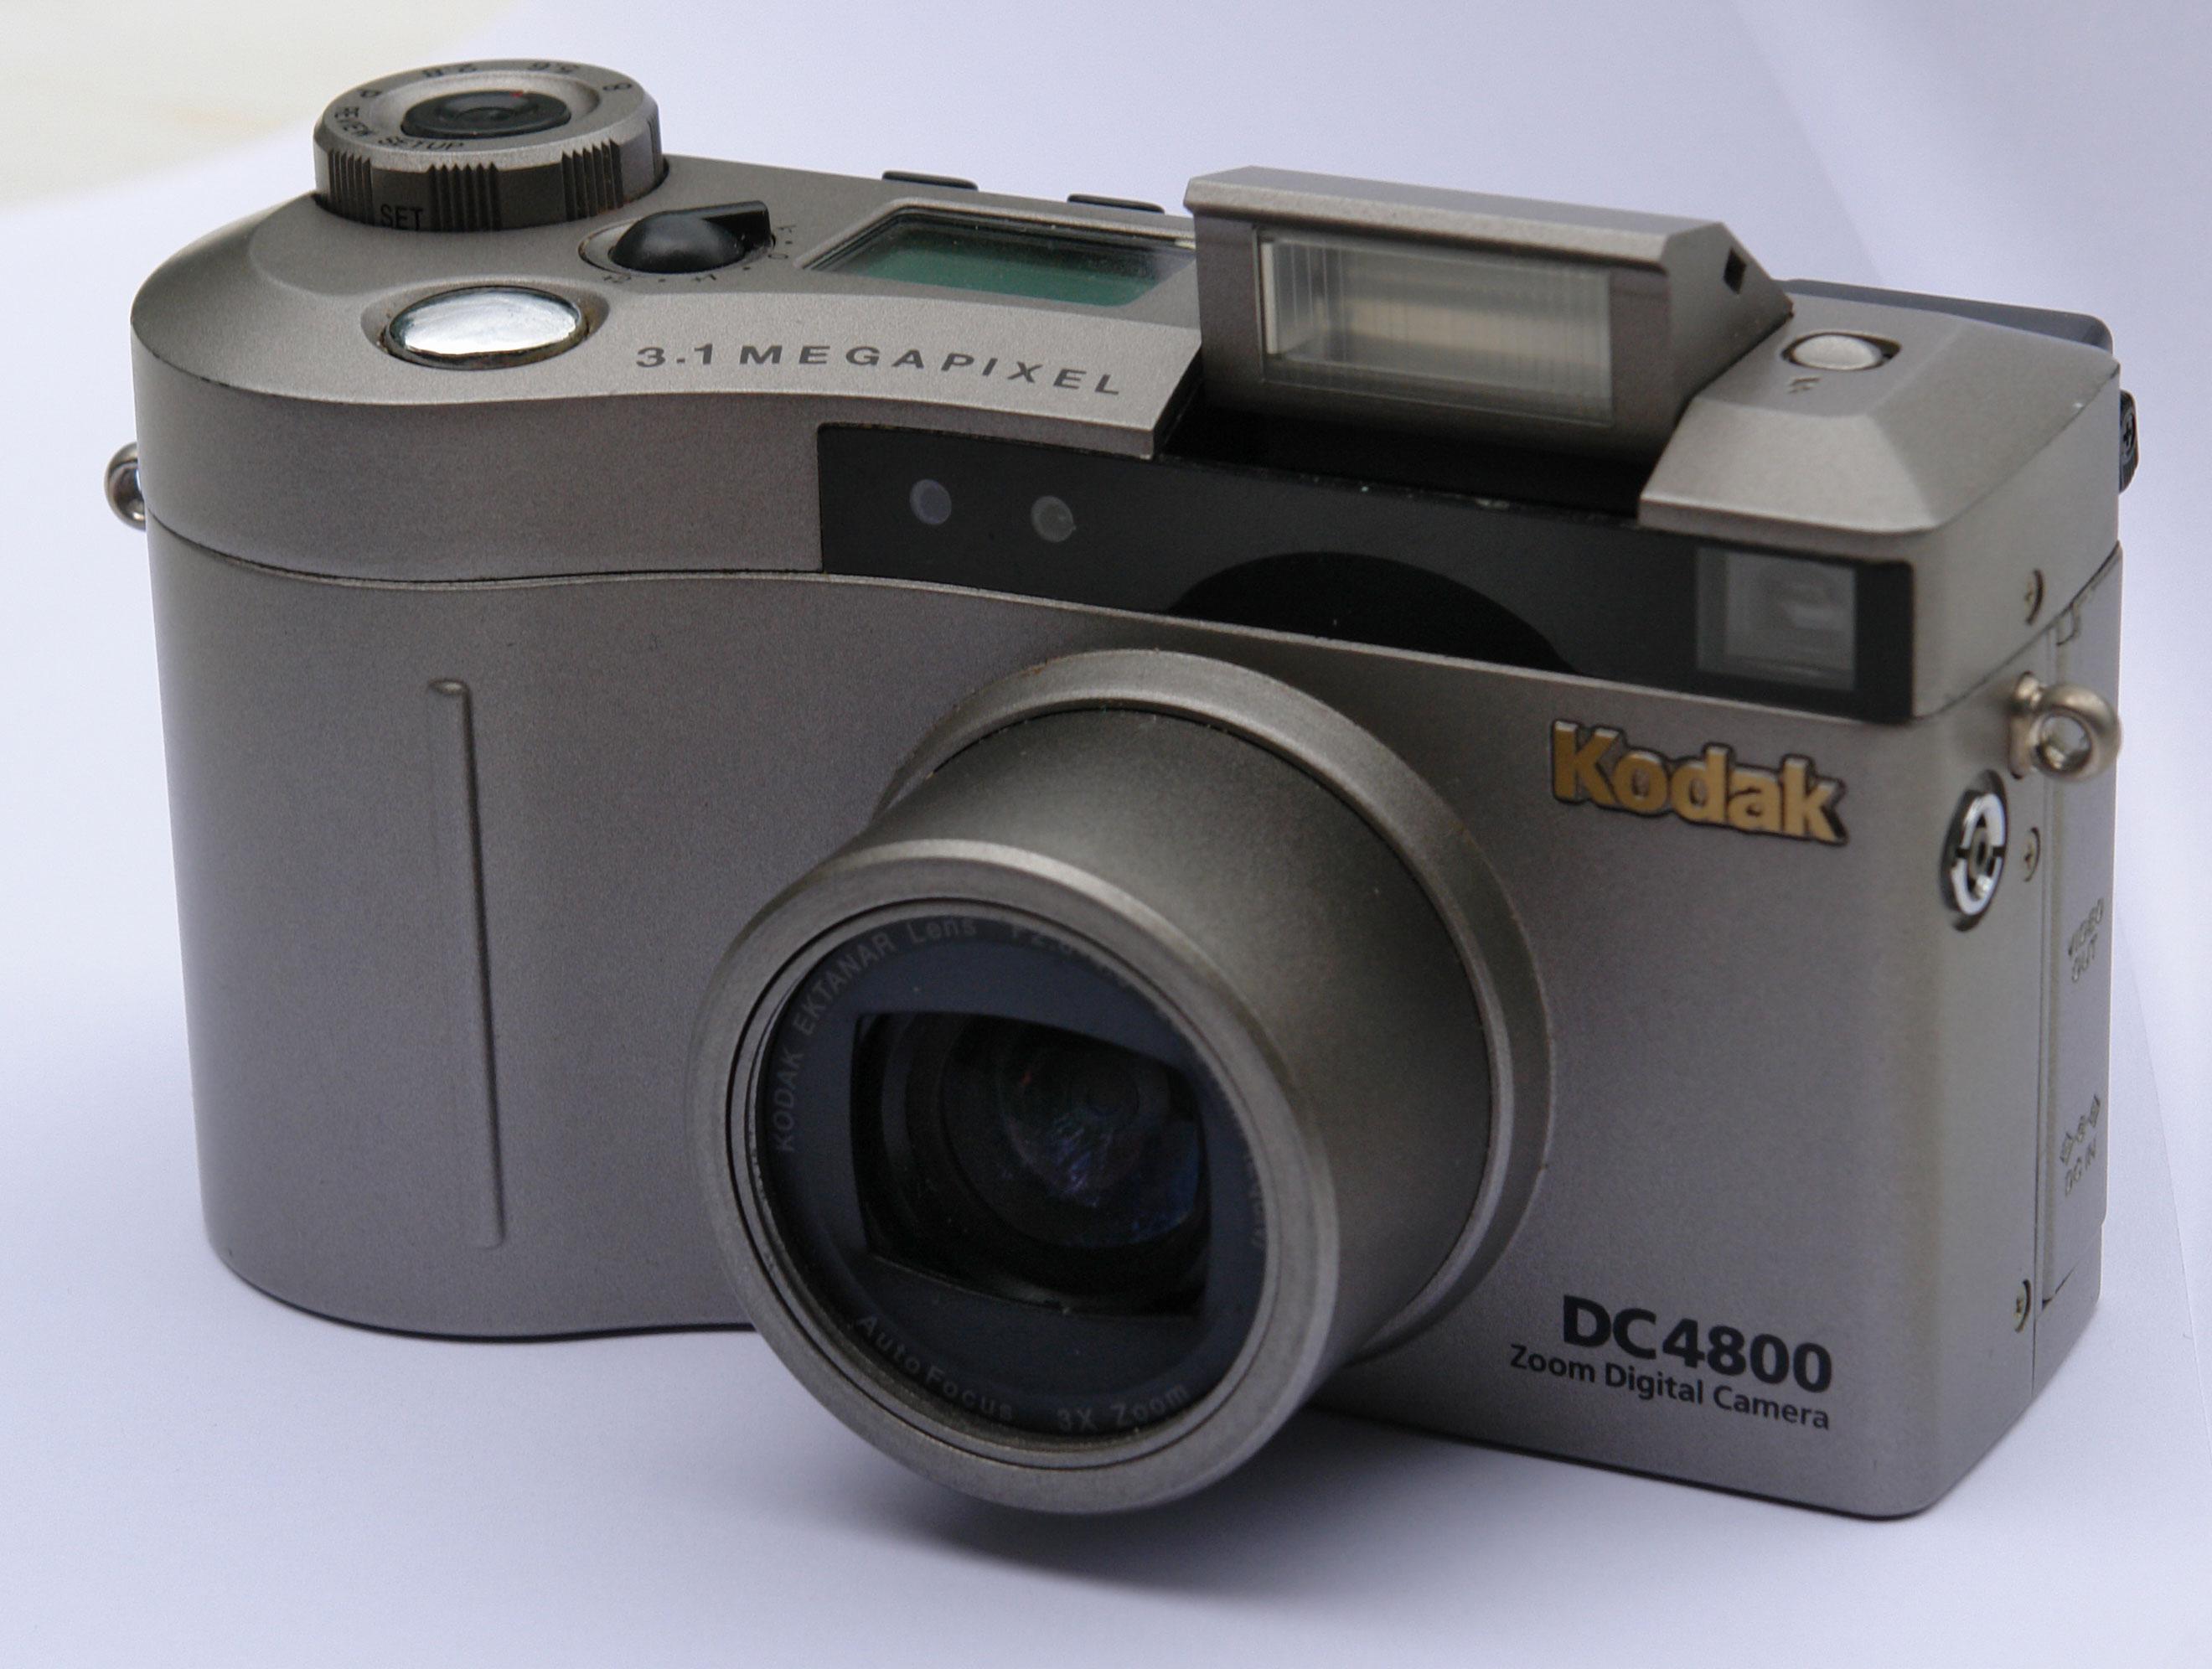 Kodak Digital Camera DC4800 Driver for Windows 10